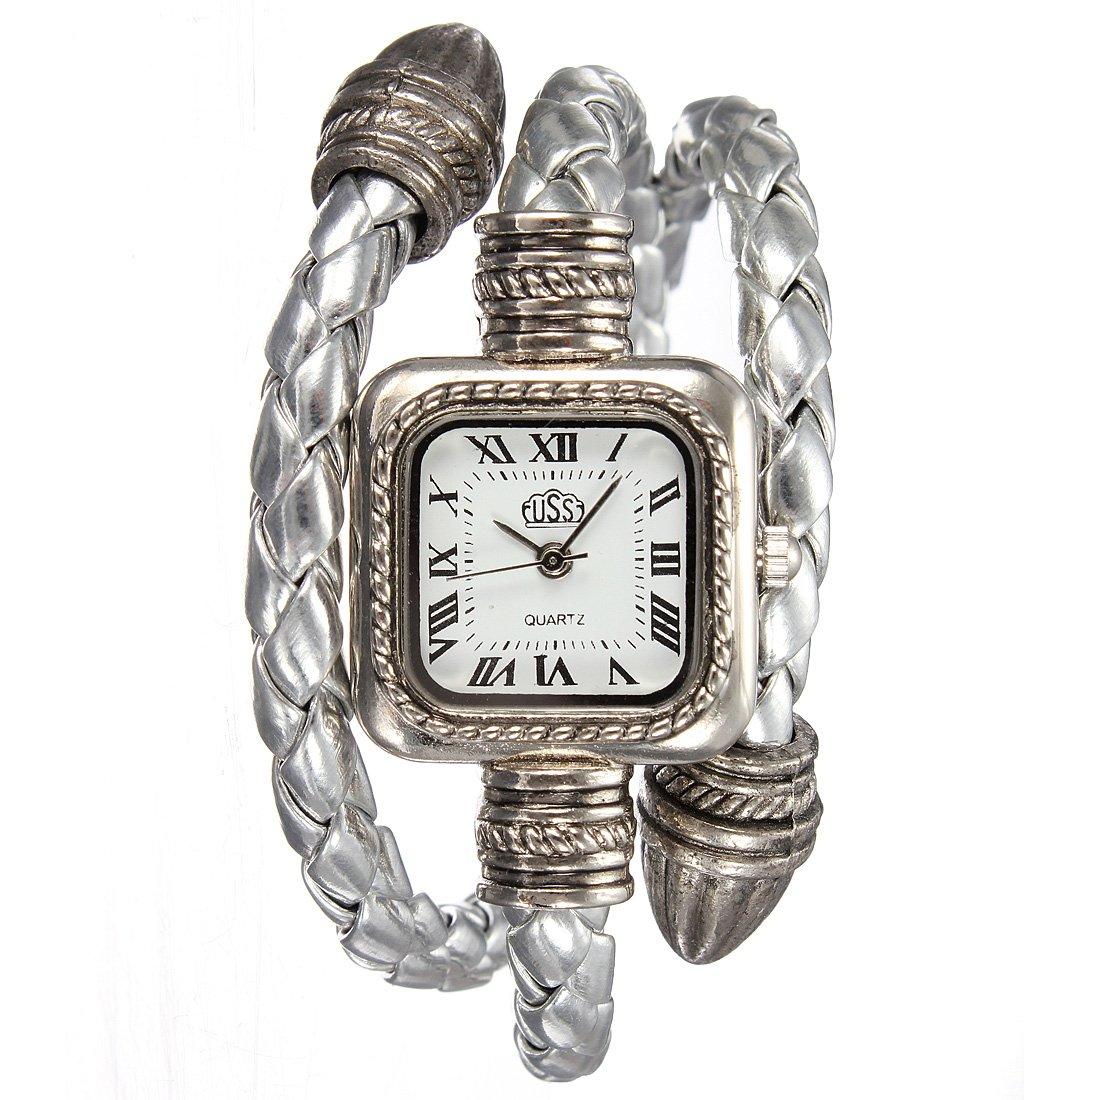 Lady Fashion Knitted Leather Bracelet Style Square Quartz Wrist Watch